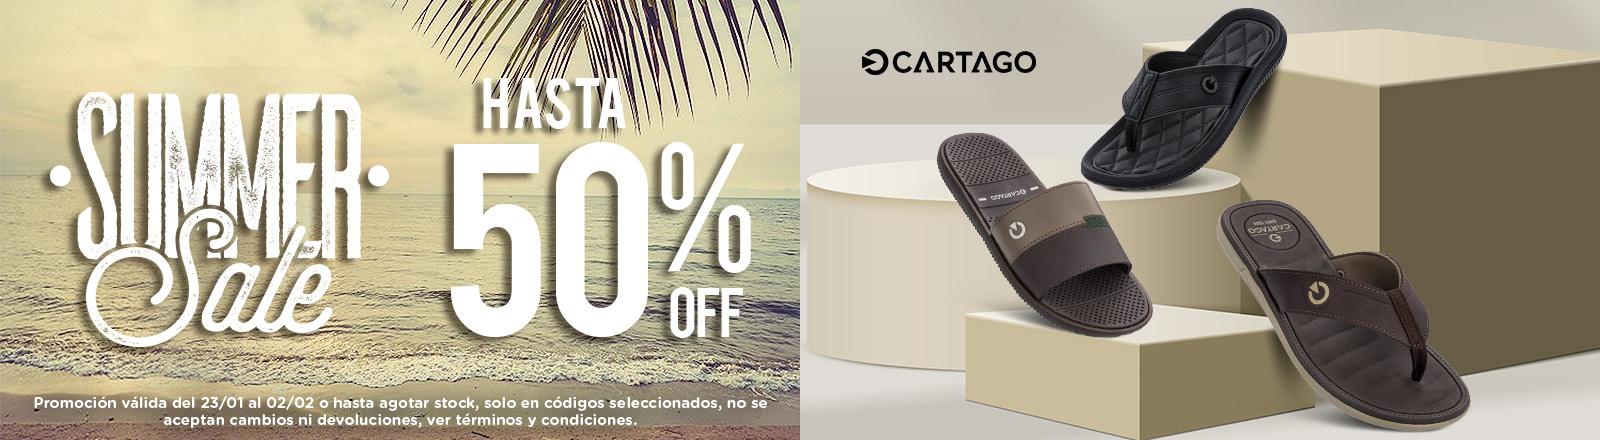 welcome sale cartago